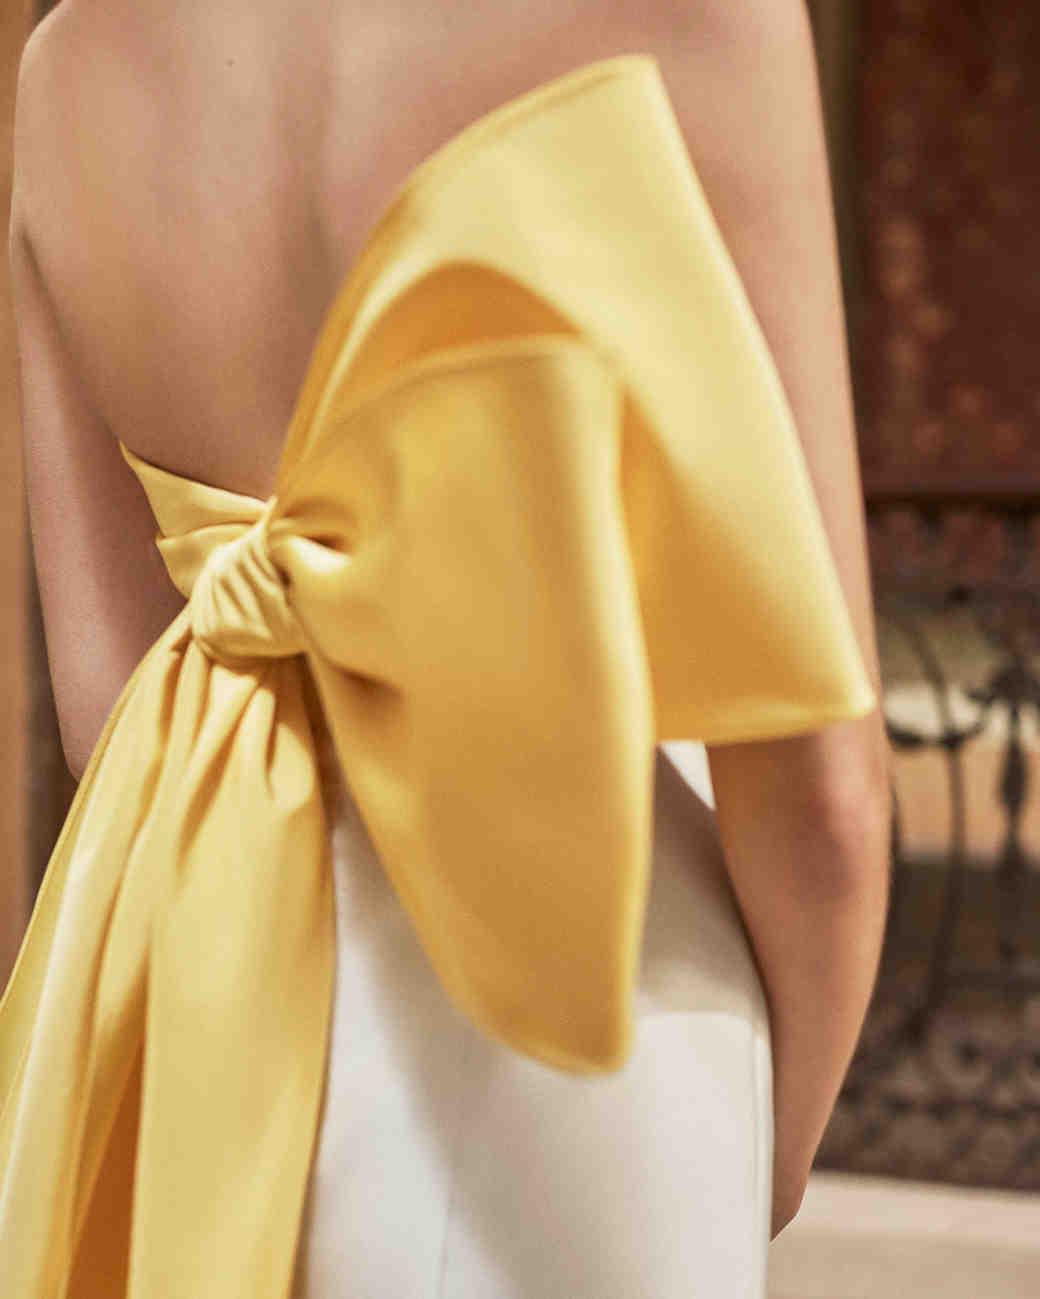 Carolina Herrera wedding dress spring 2019 sheath with gold bow in back